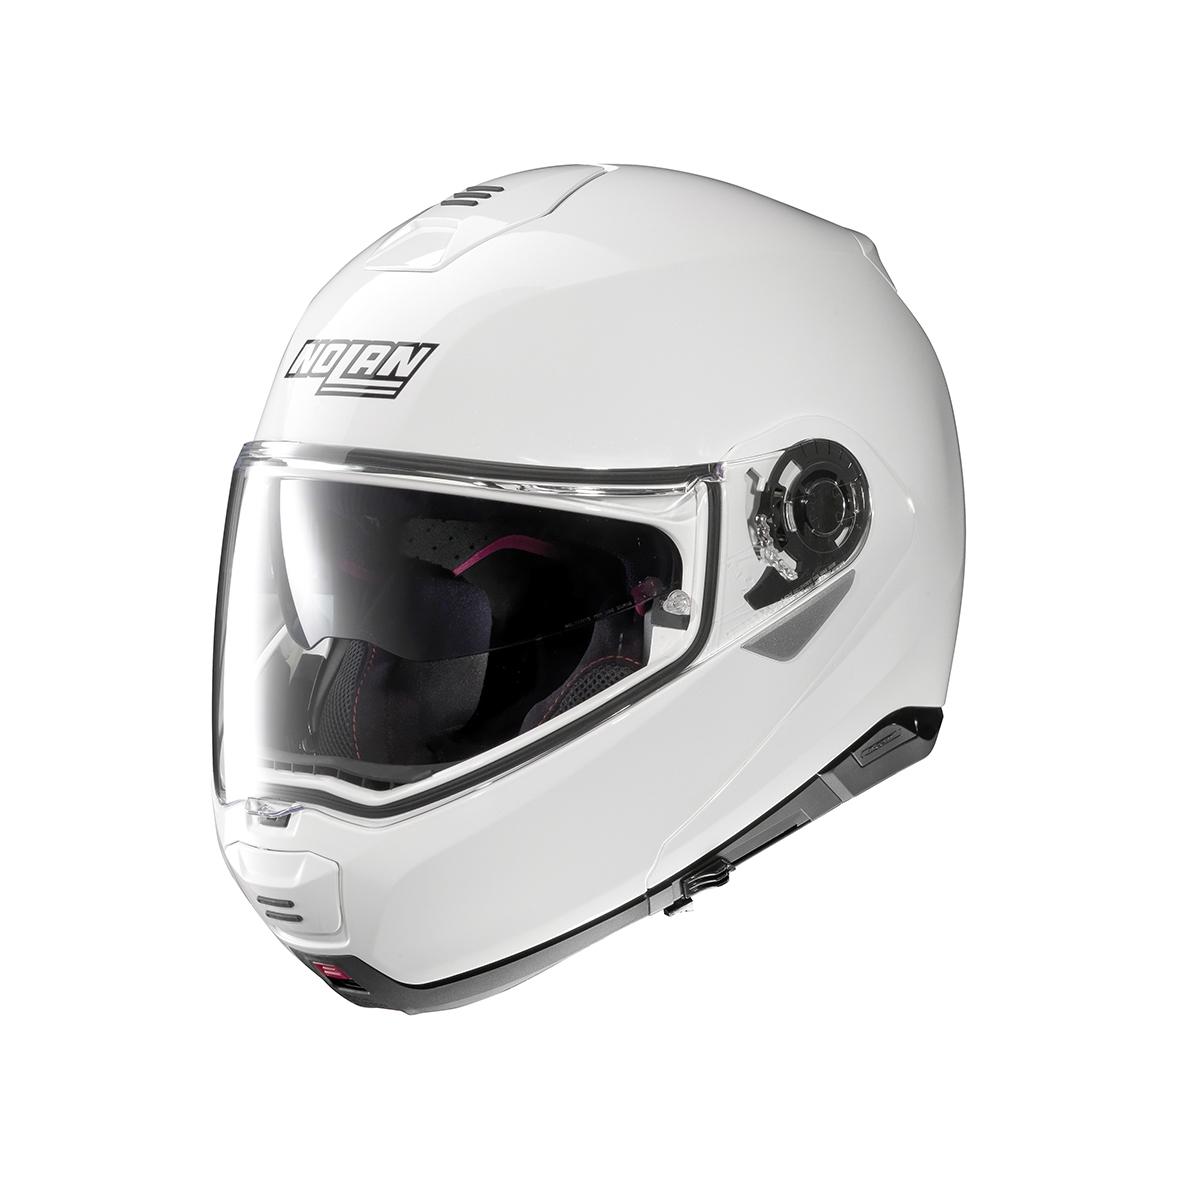 Moto helma Nolan N100-5 Classic N-Com Metal White 5